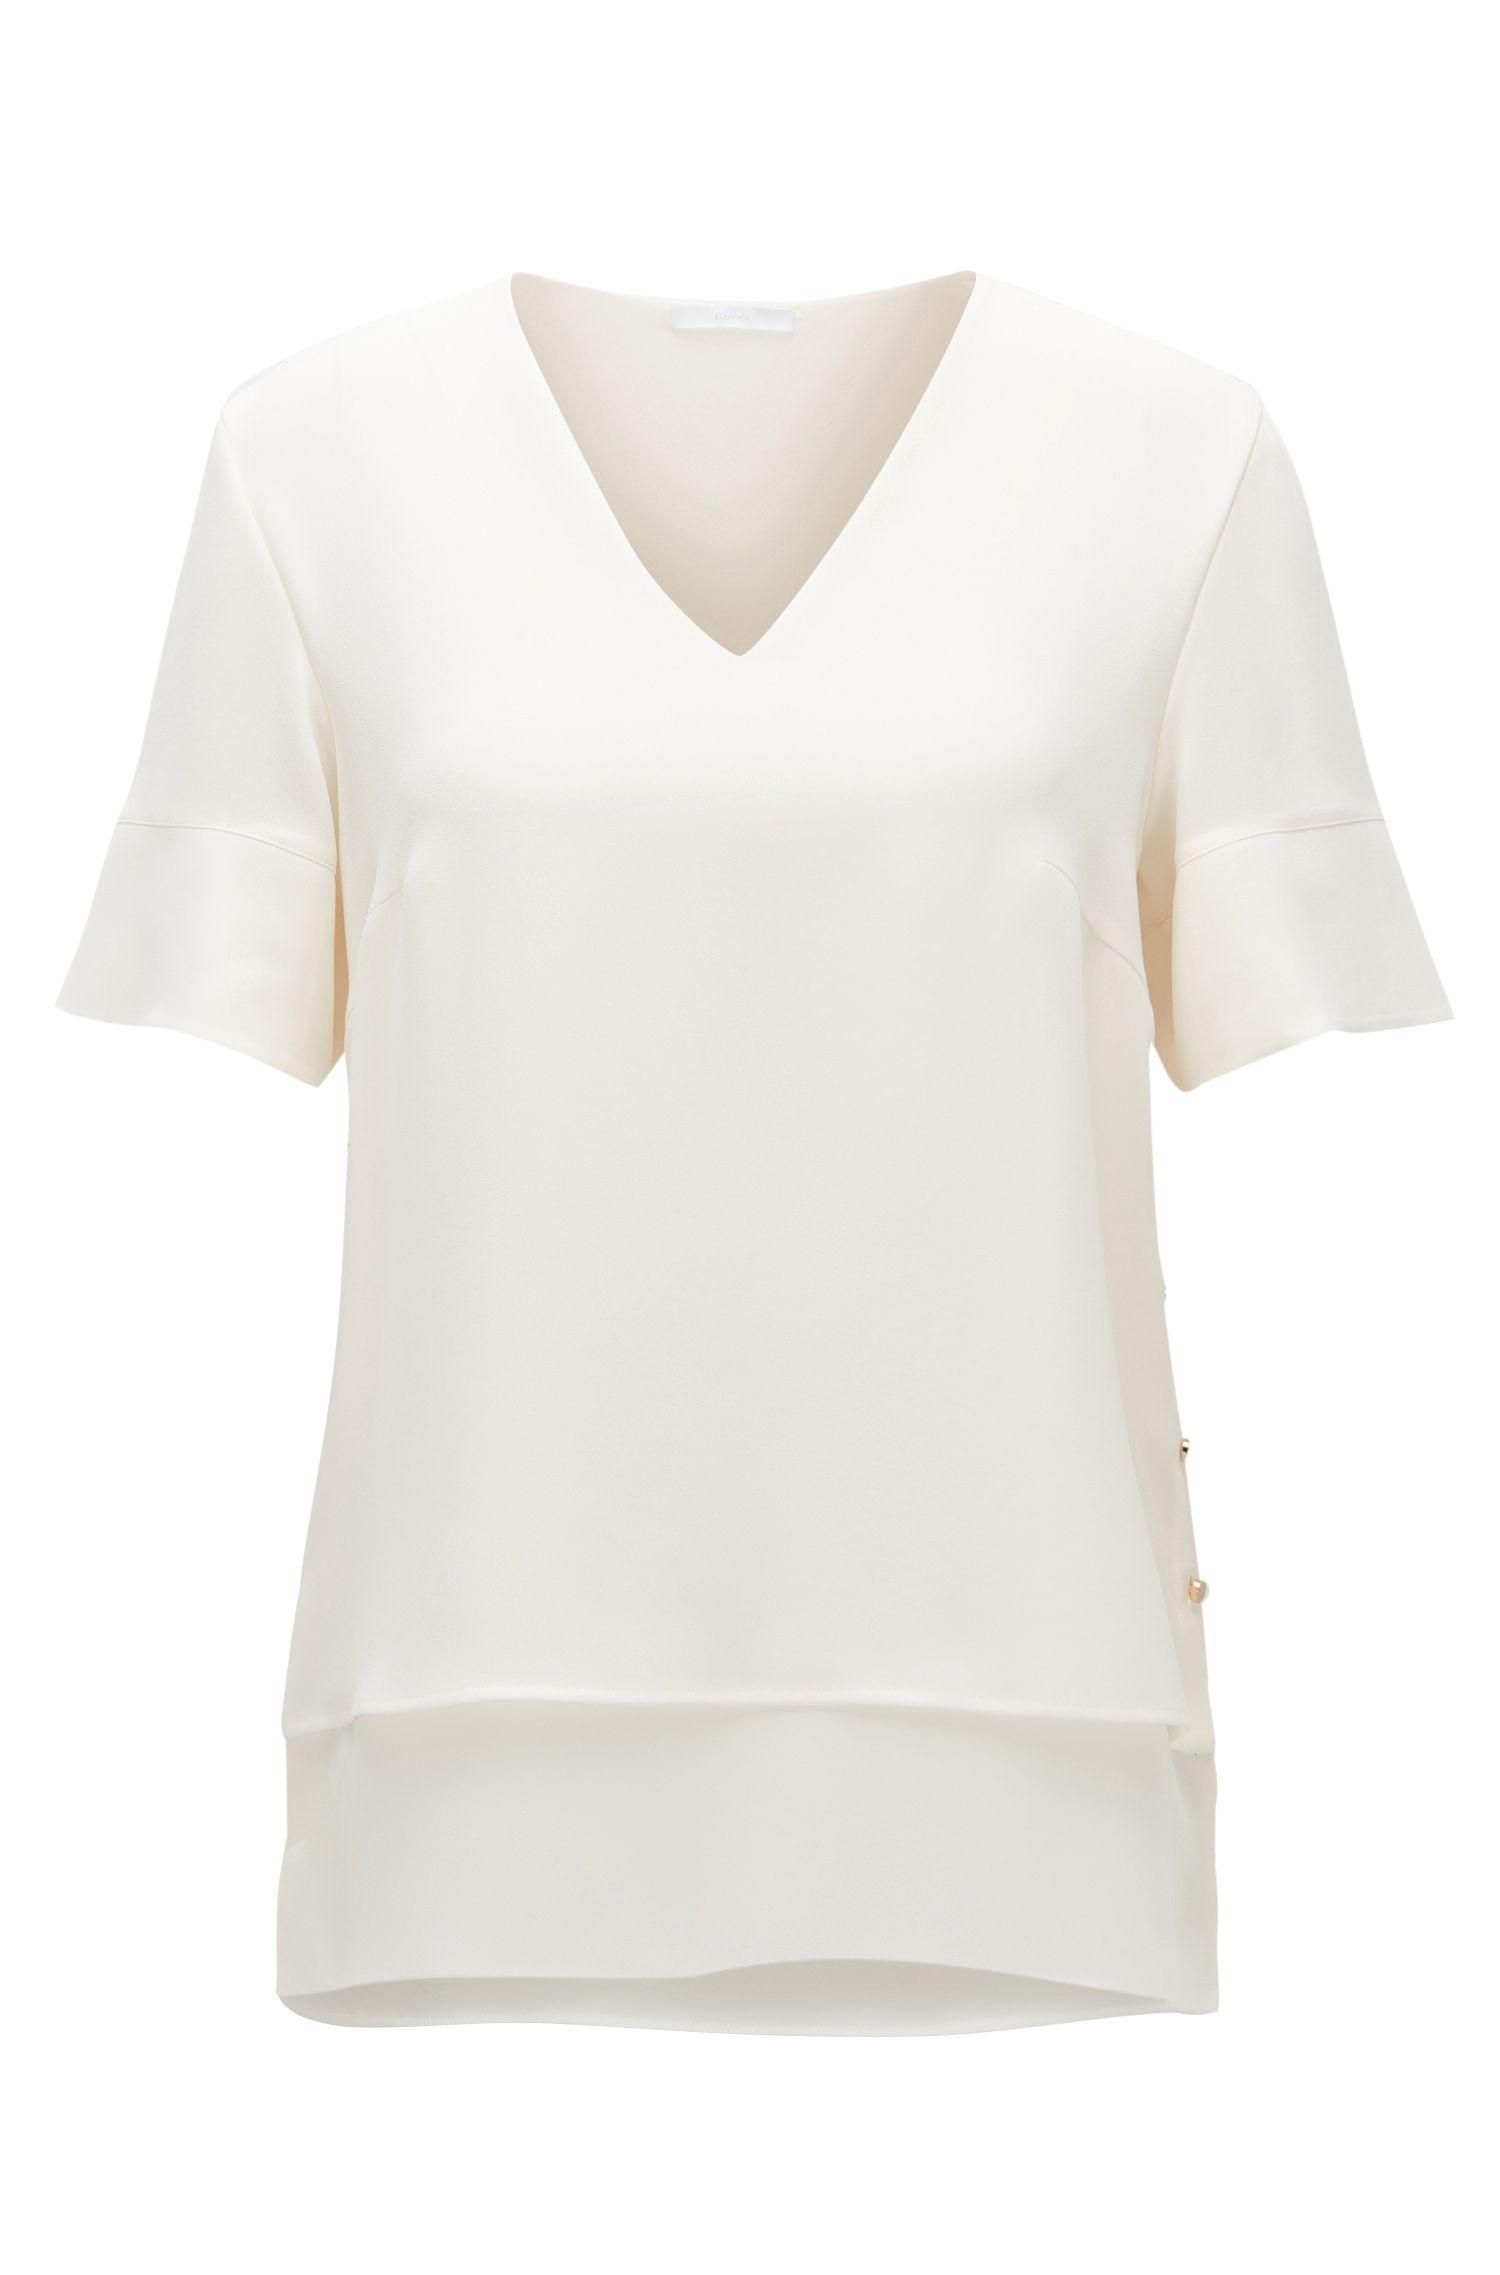 Dubbellaags T-shirt van vloeiend materiaal